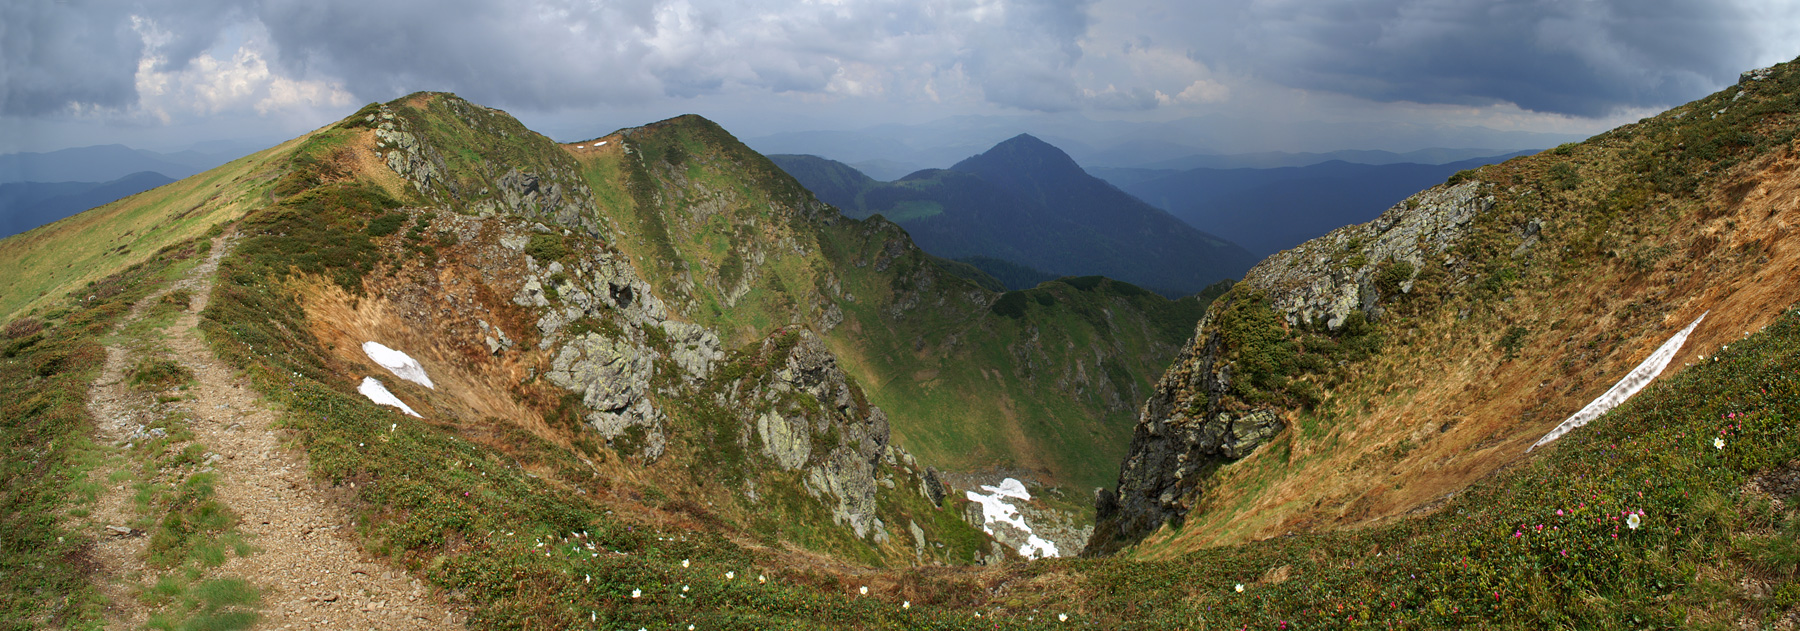 Гуцульські Альпи - Мармароський масив